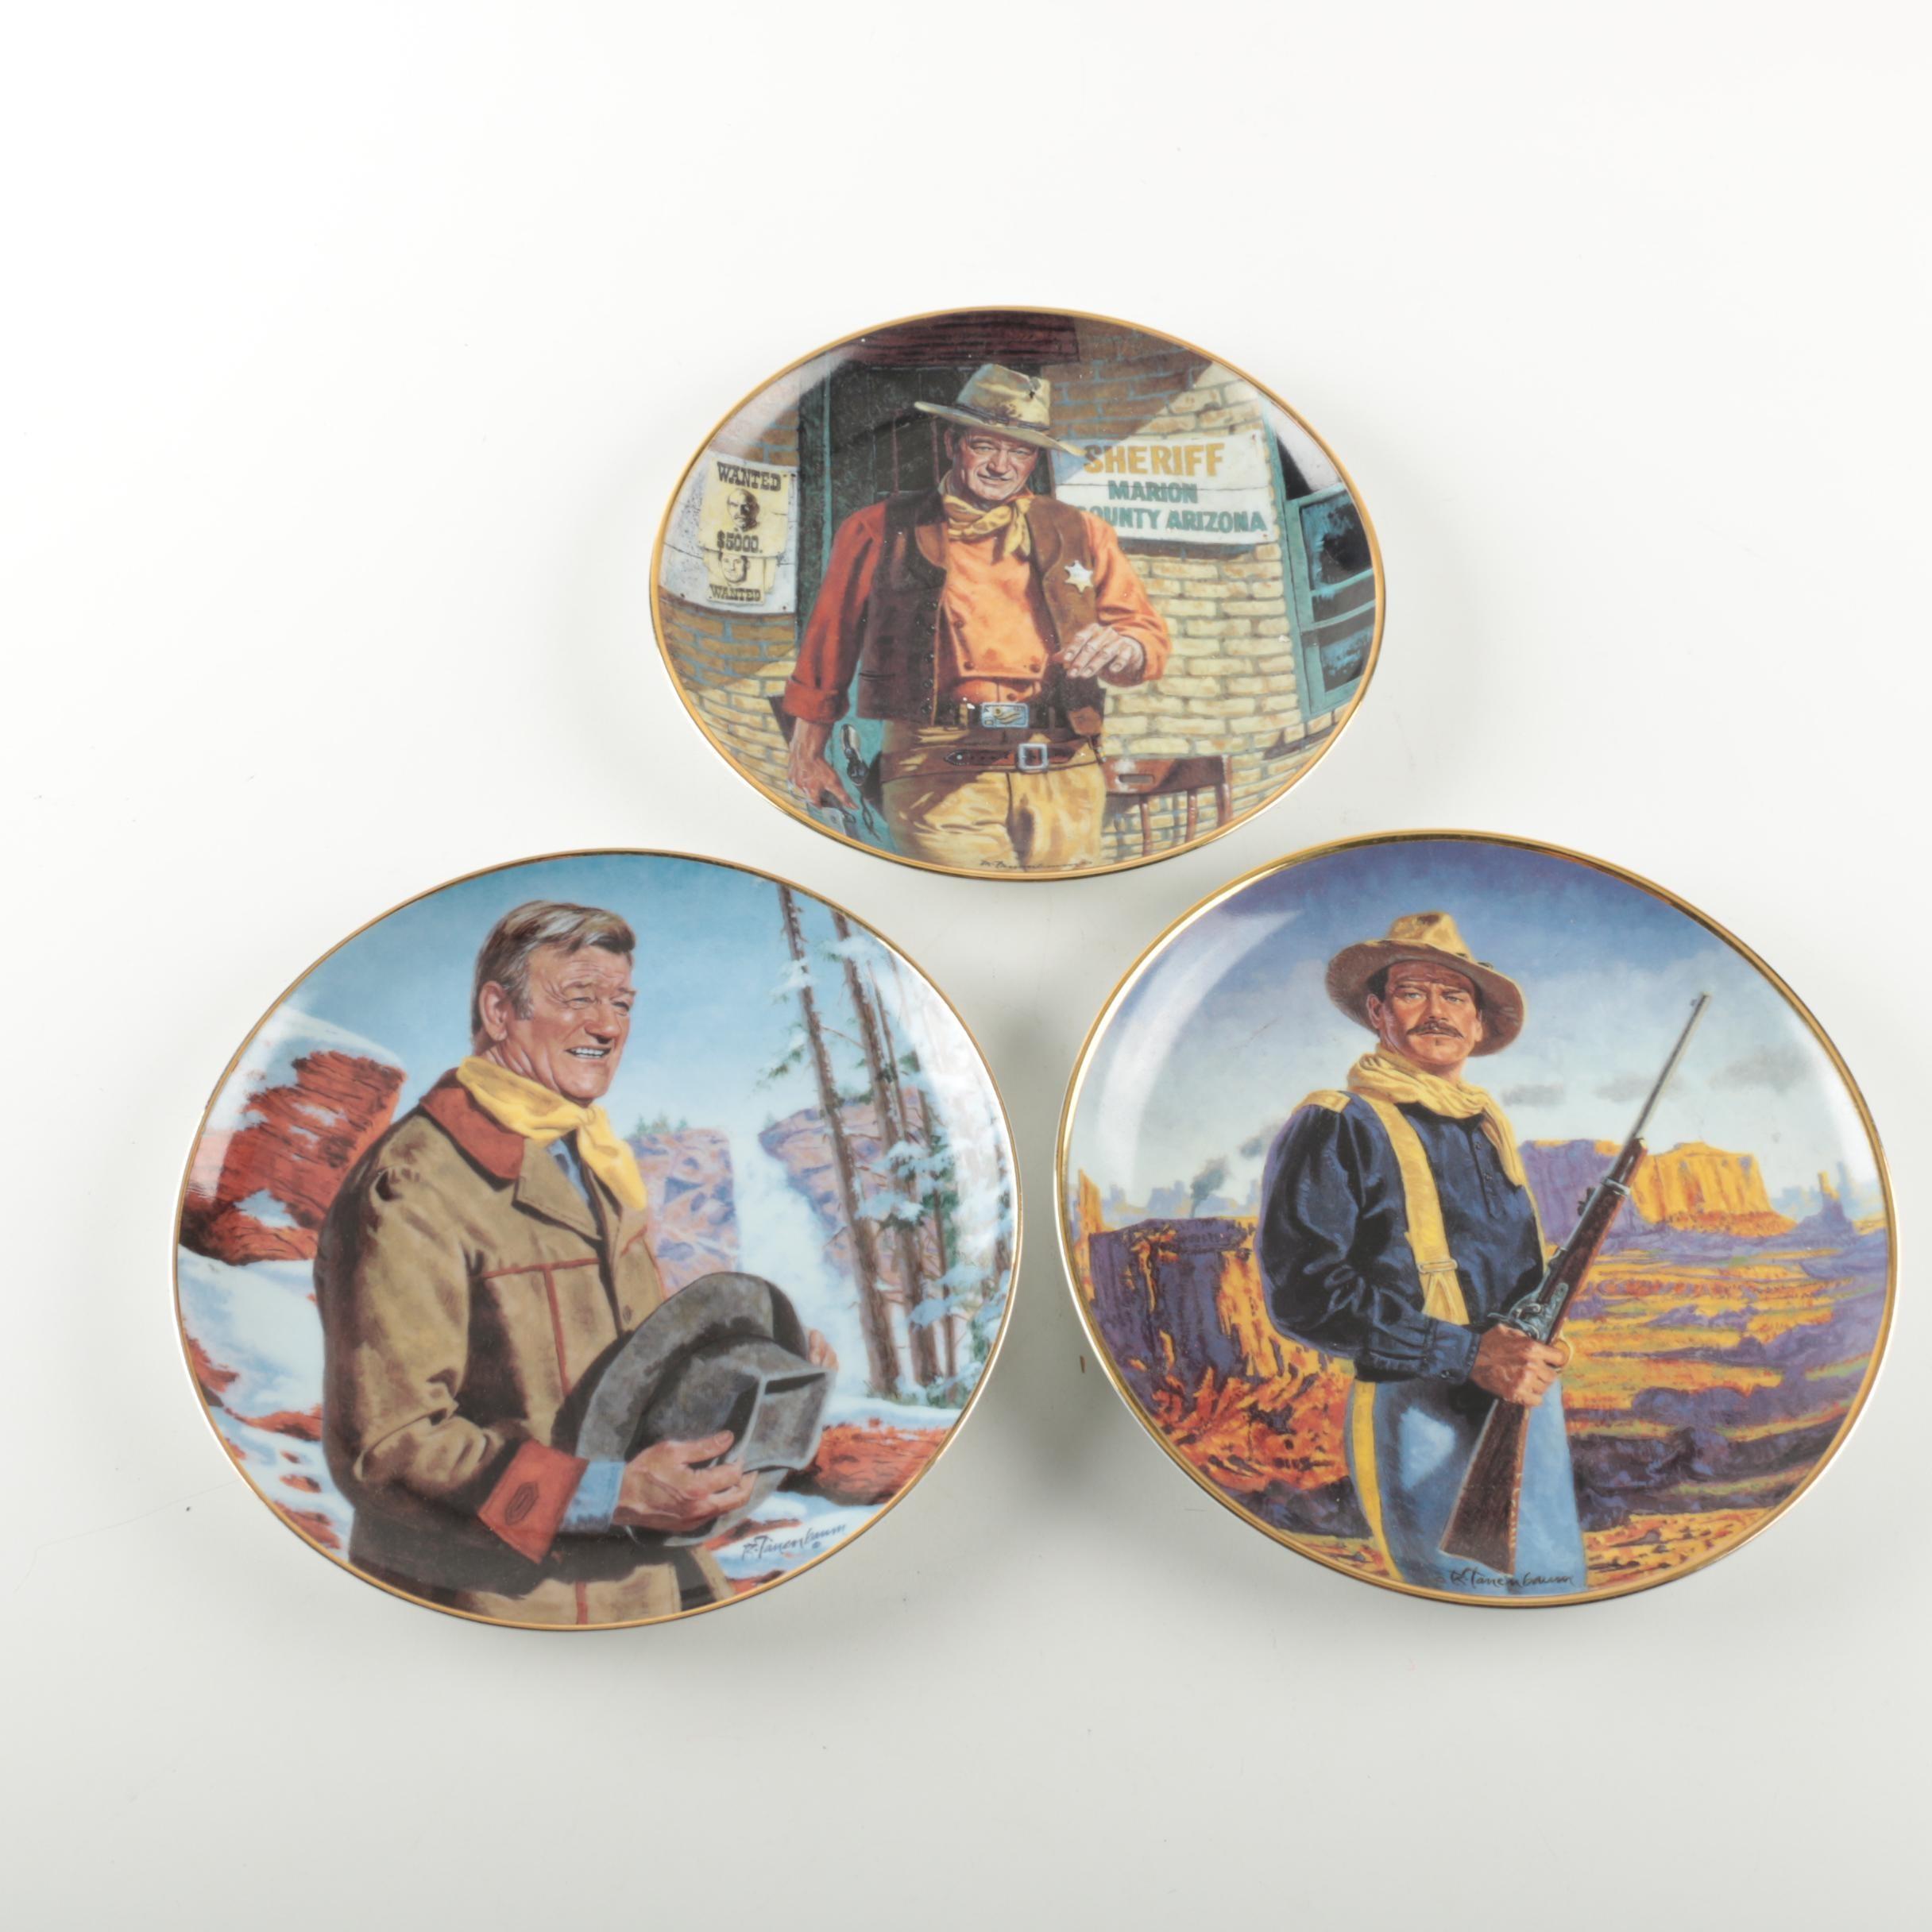 John Wayne Limited Edition Collectible Plates